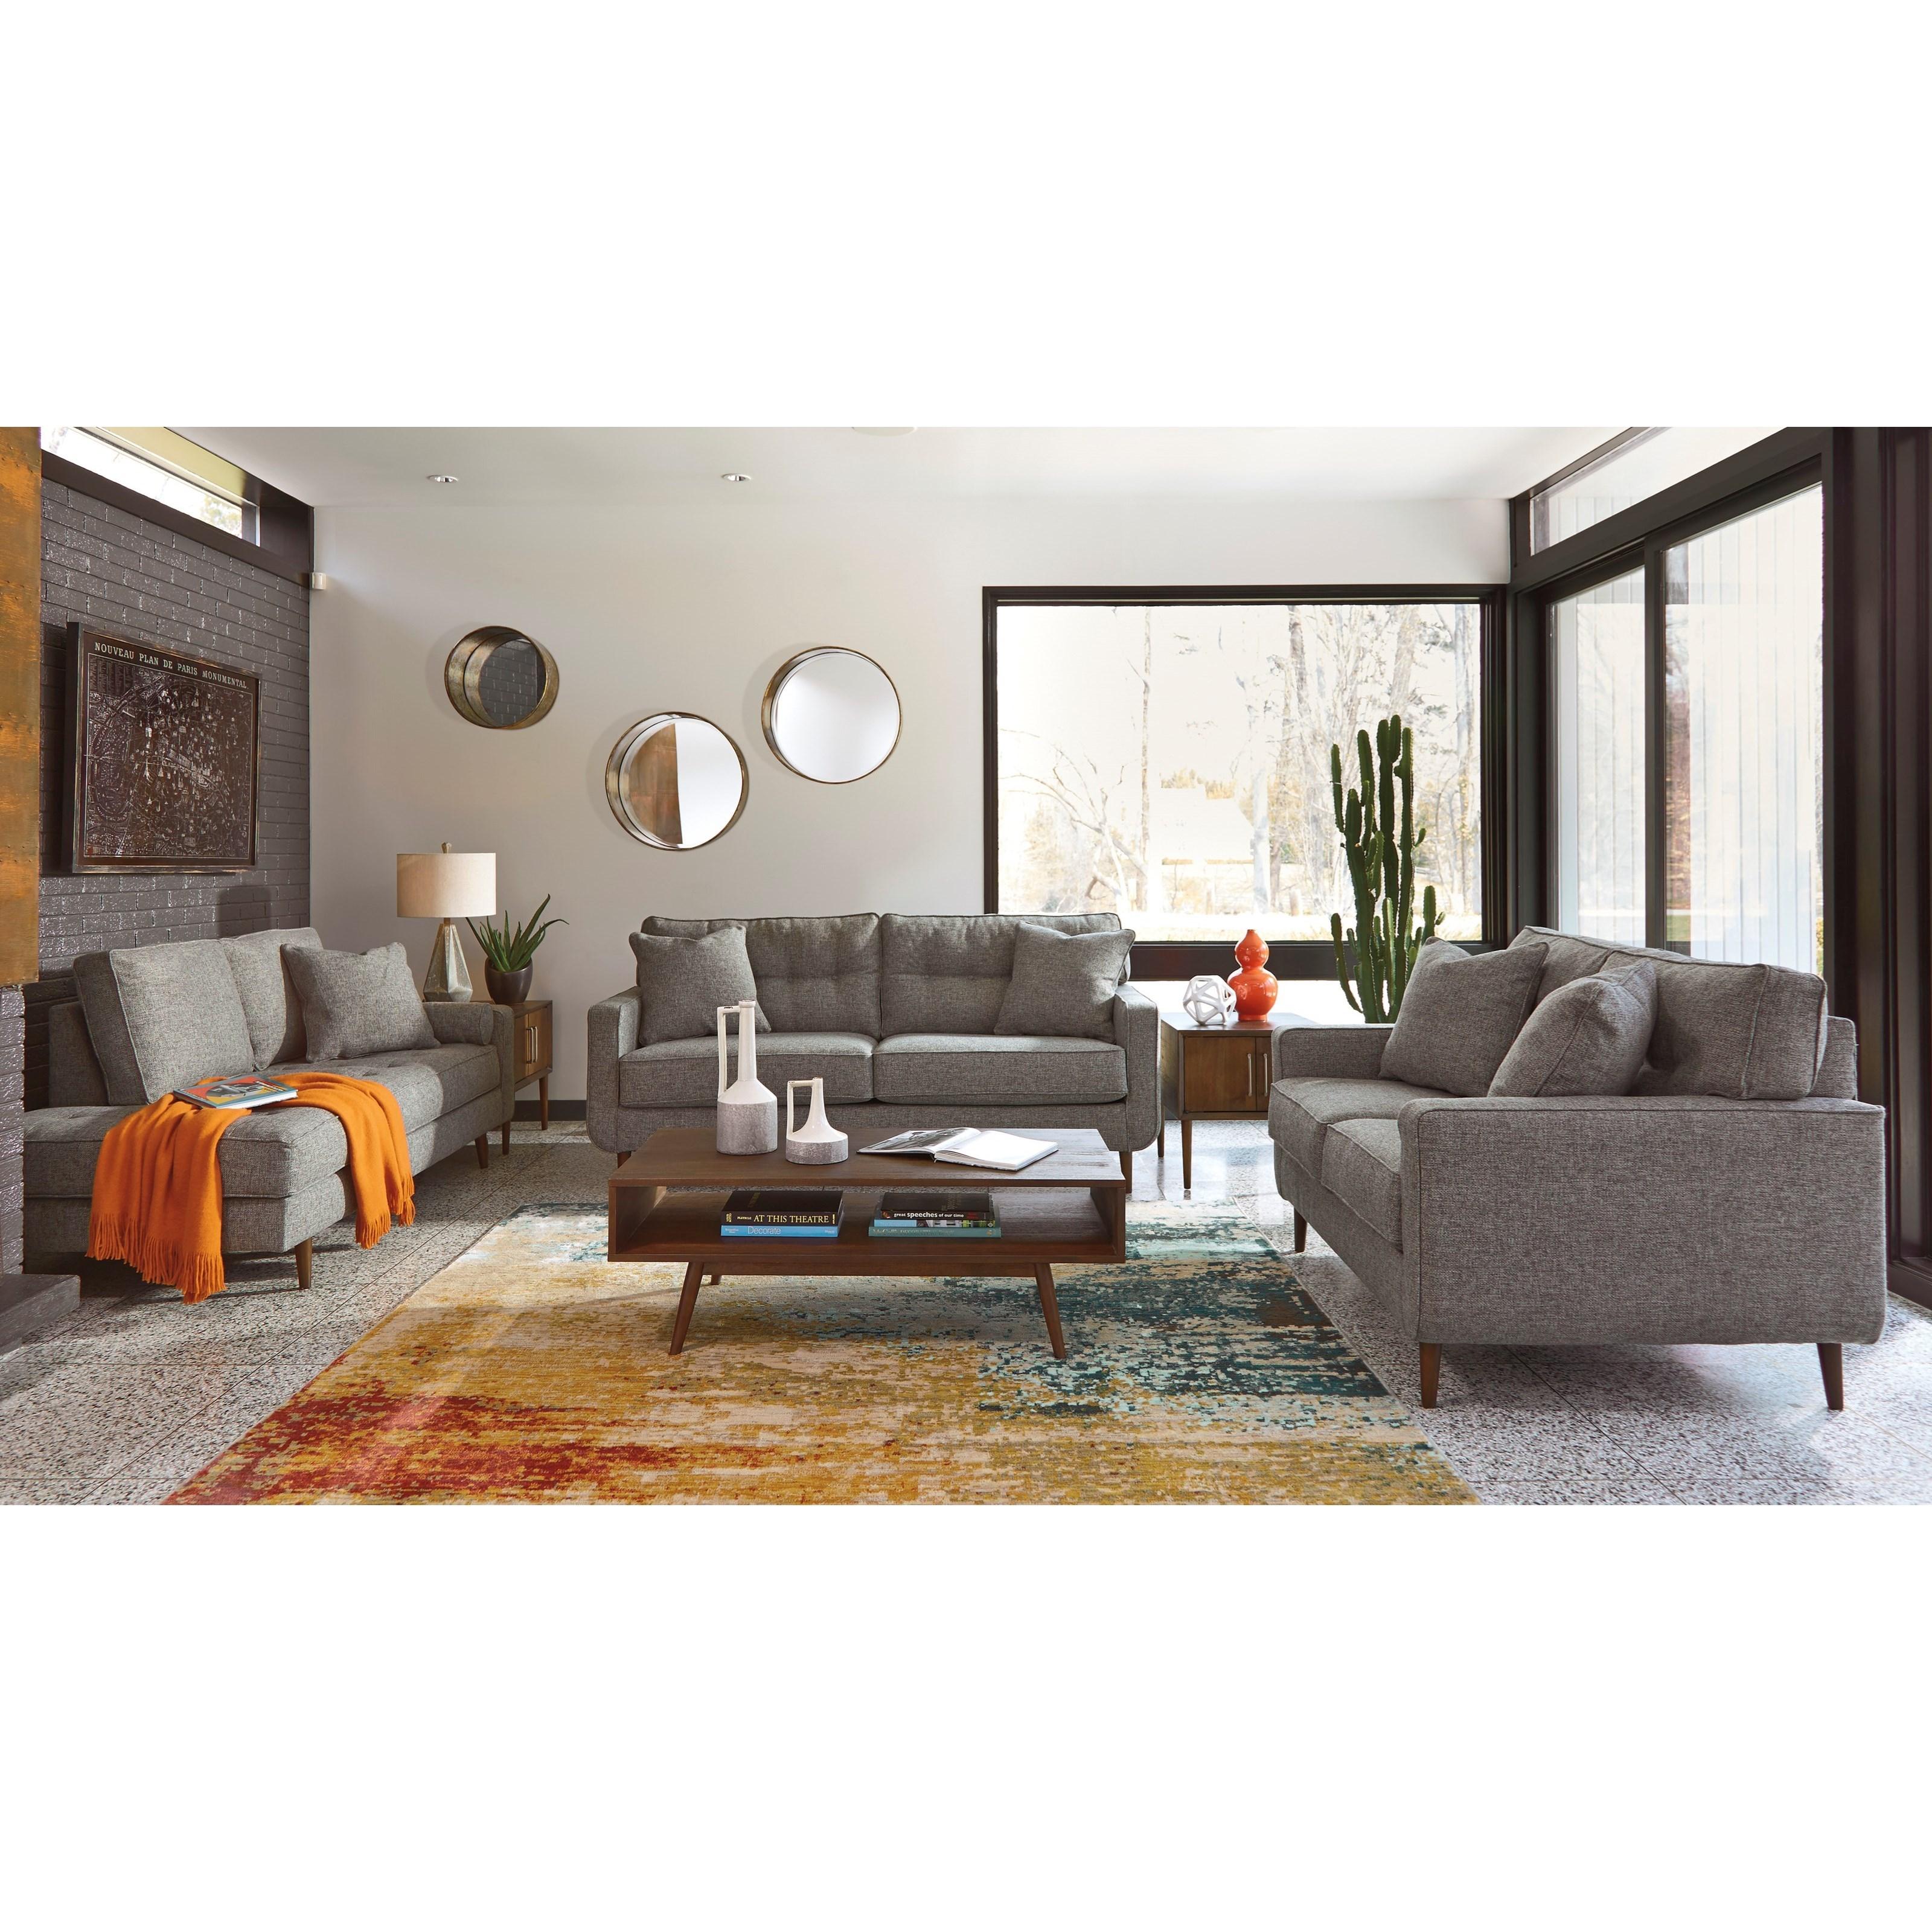 Ashley Furniture Zardoni Stationary Living Room Group   Item Number: 11402 Living  Room Group 3